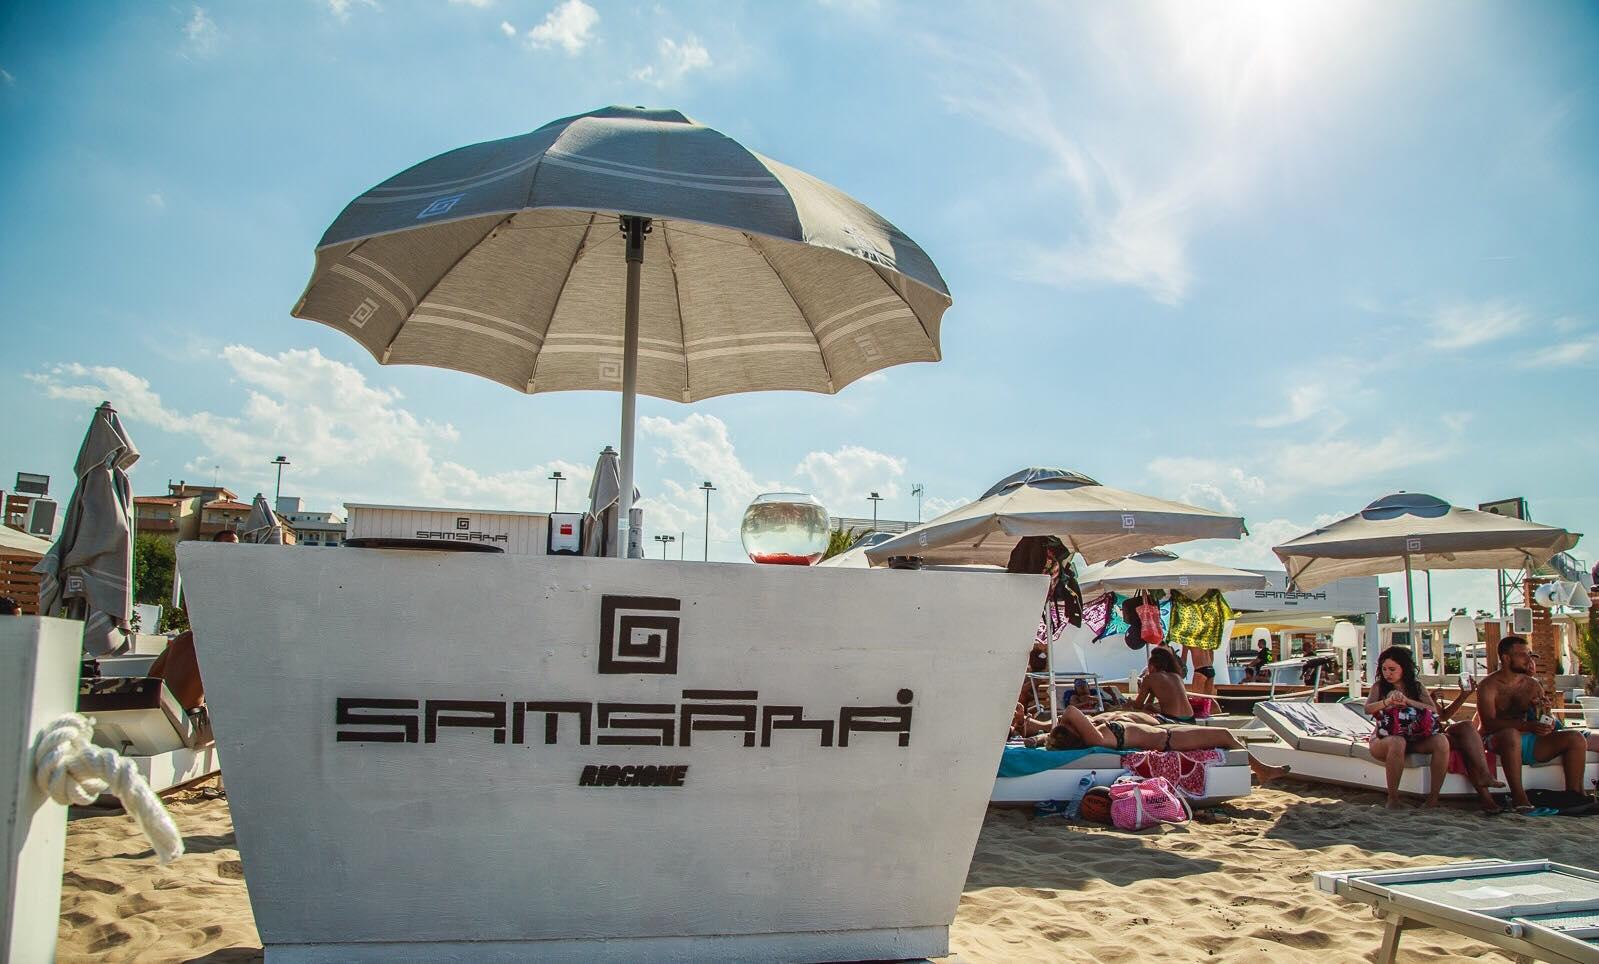 Samsara2